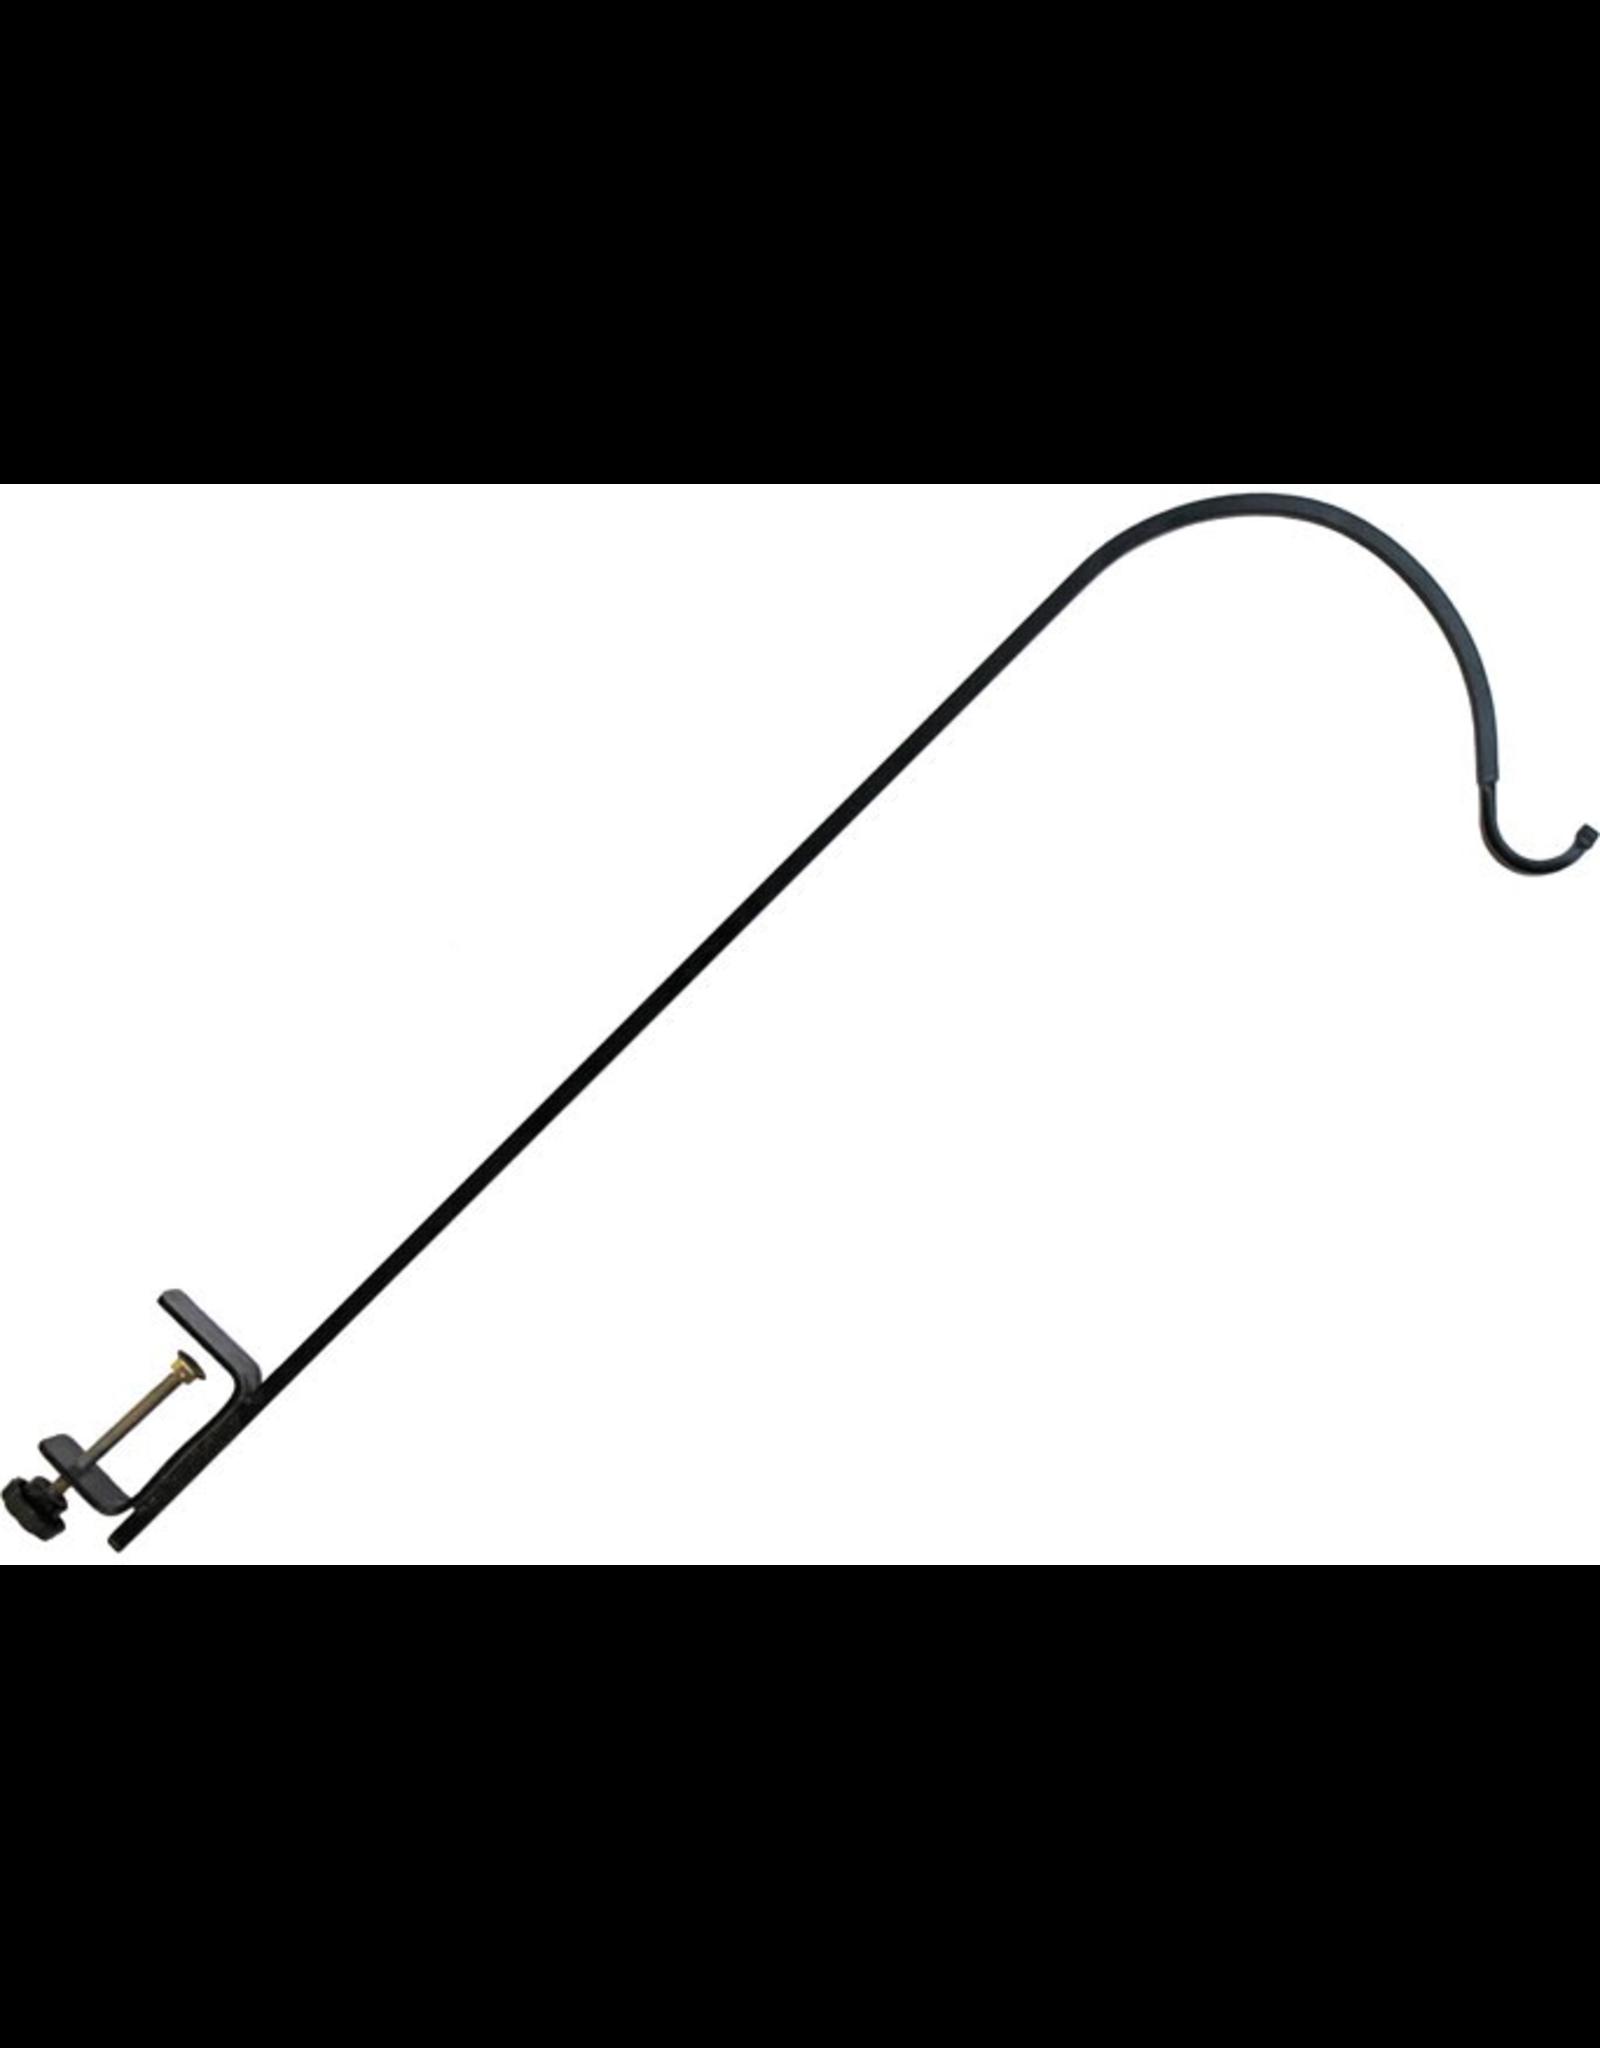 Erva ETRT2CL Wrought Iron Clamp-On Single Arm Deck Hanger